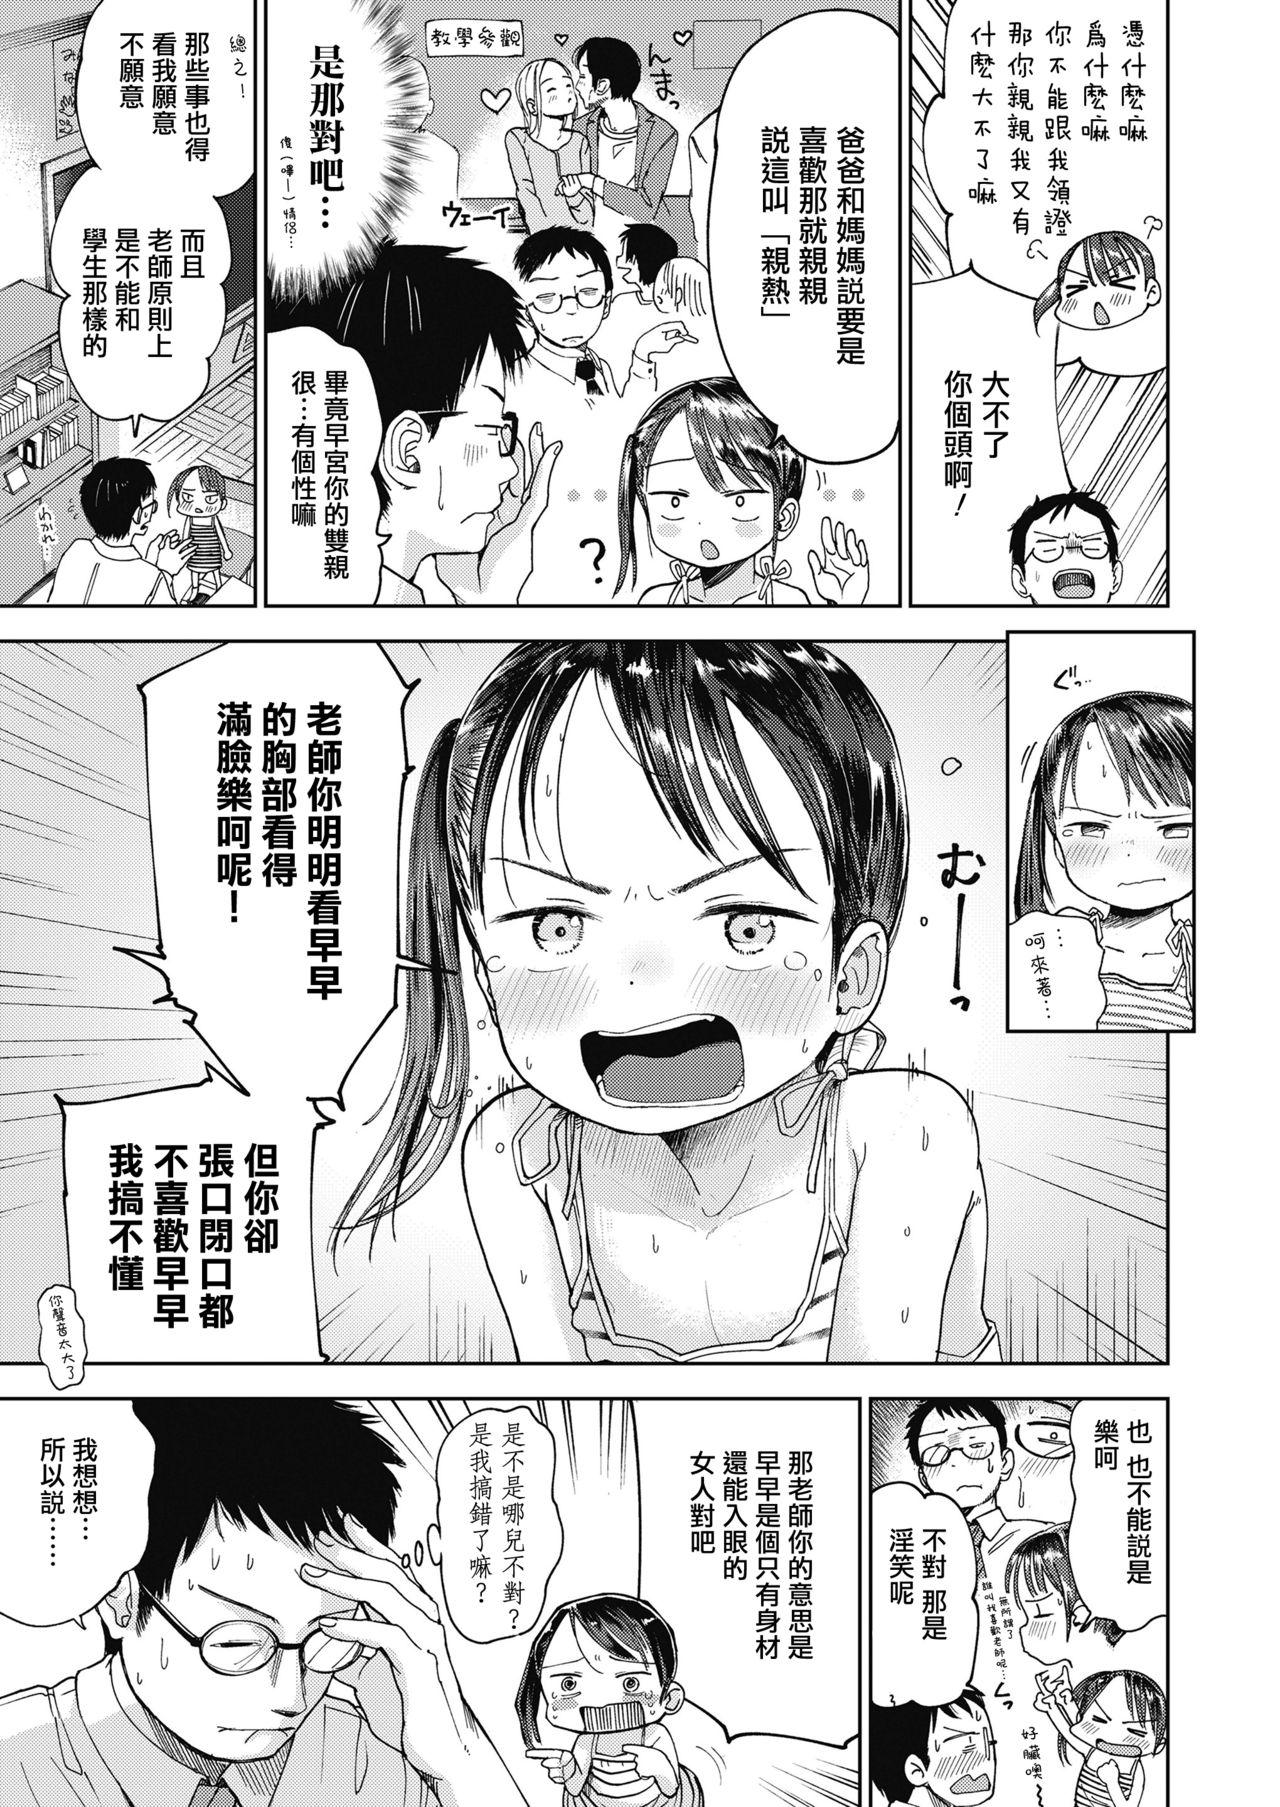 Hatsukoi Sensei 3